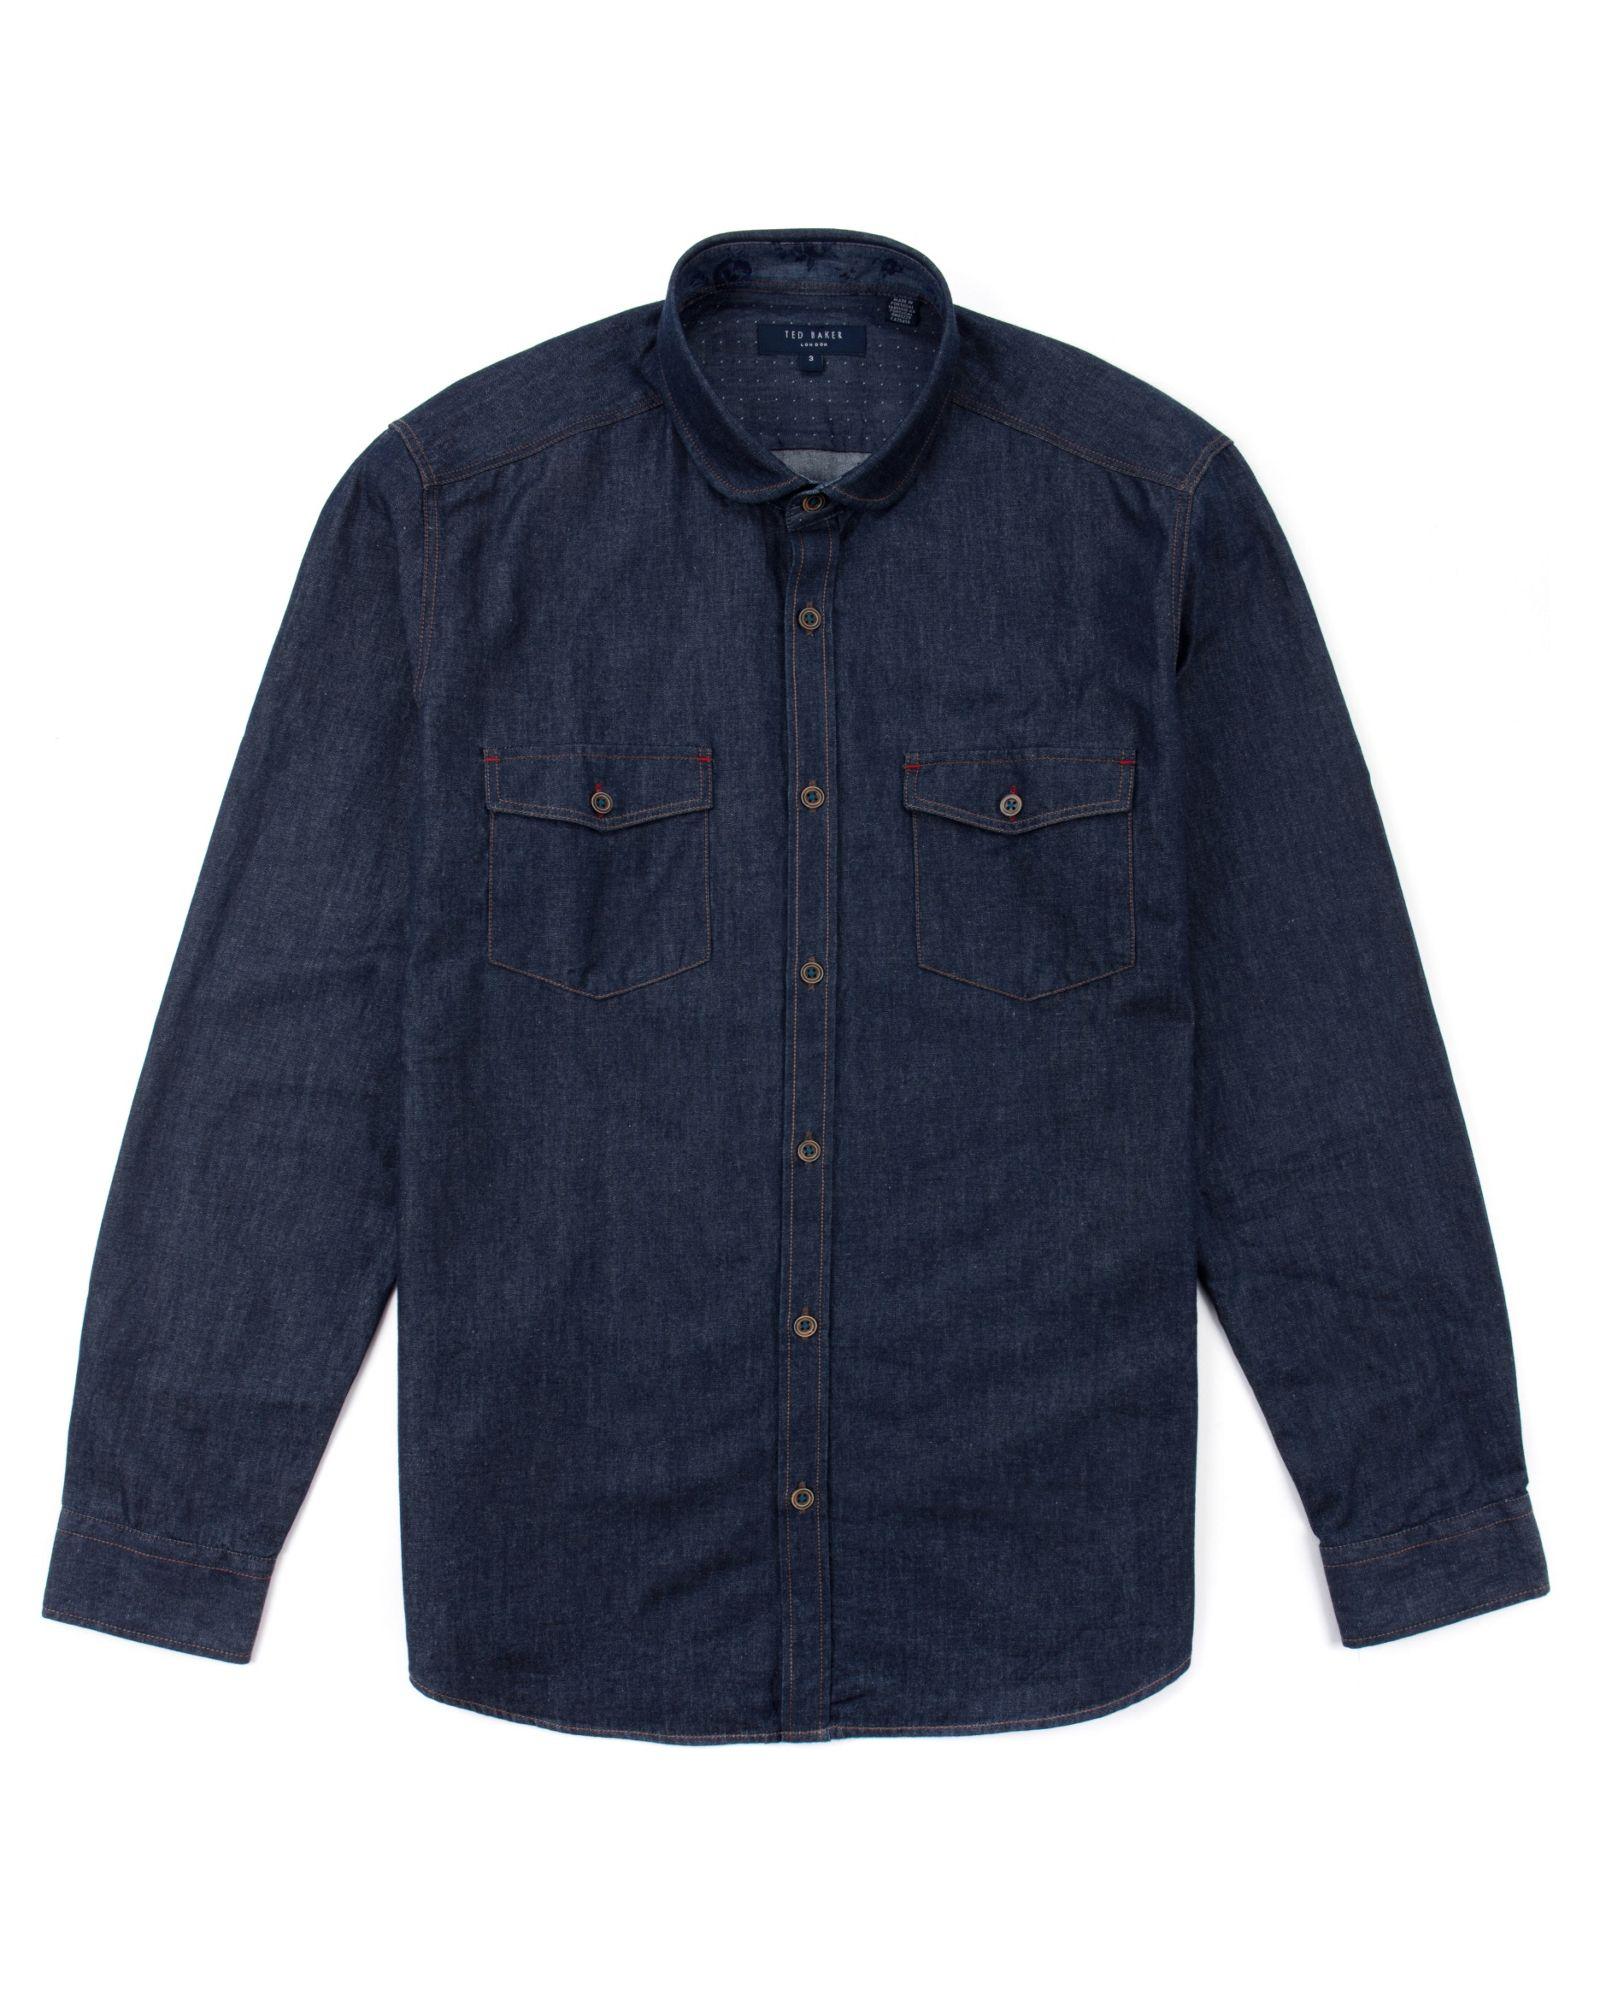 Ted baker newray round collar denim shirt in blue for men for Round collar shirt men